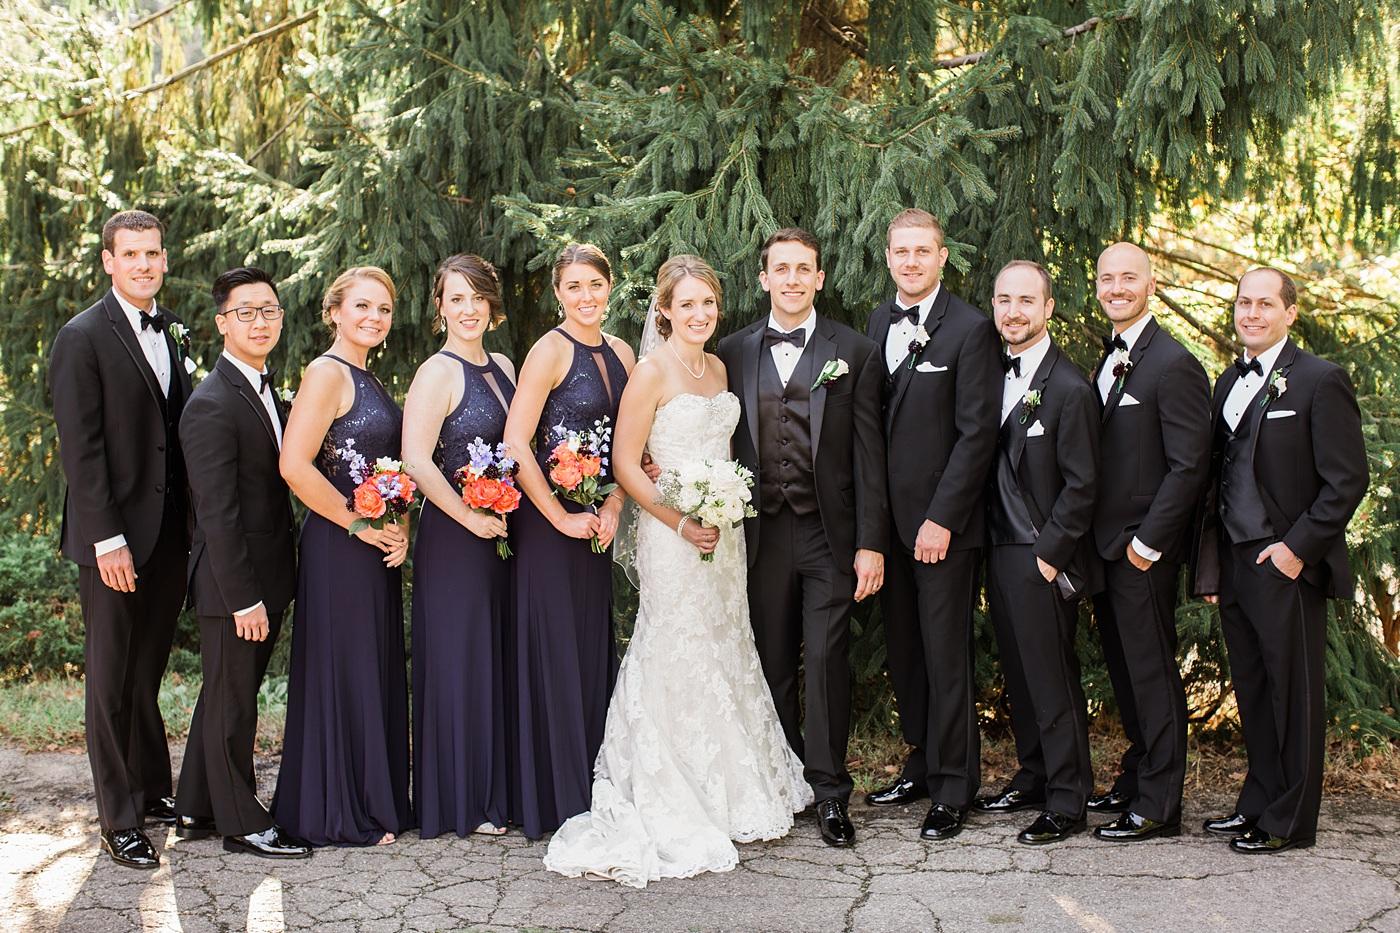 shannopin country club wedding photo